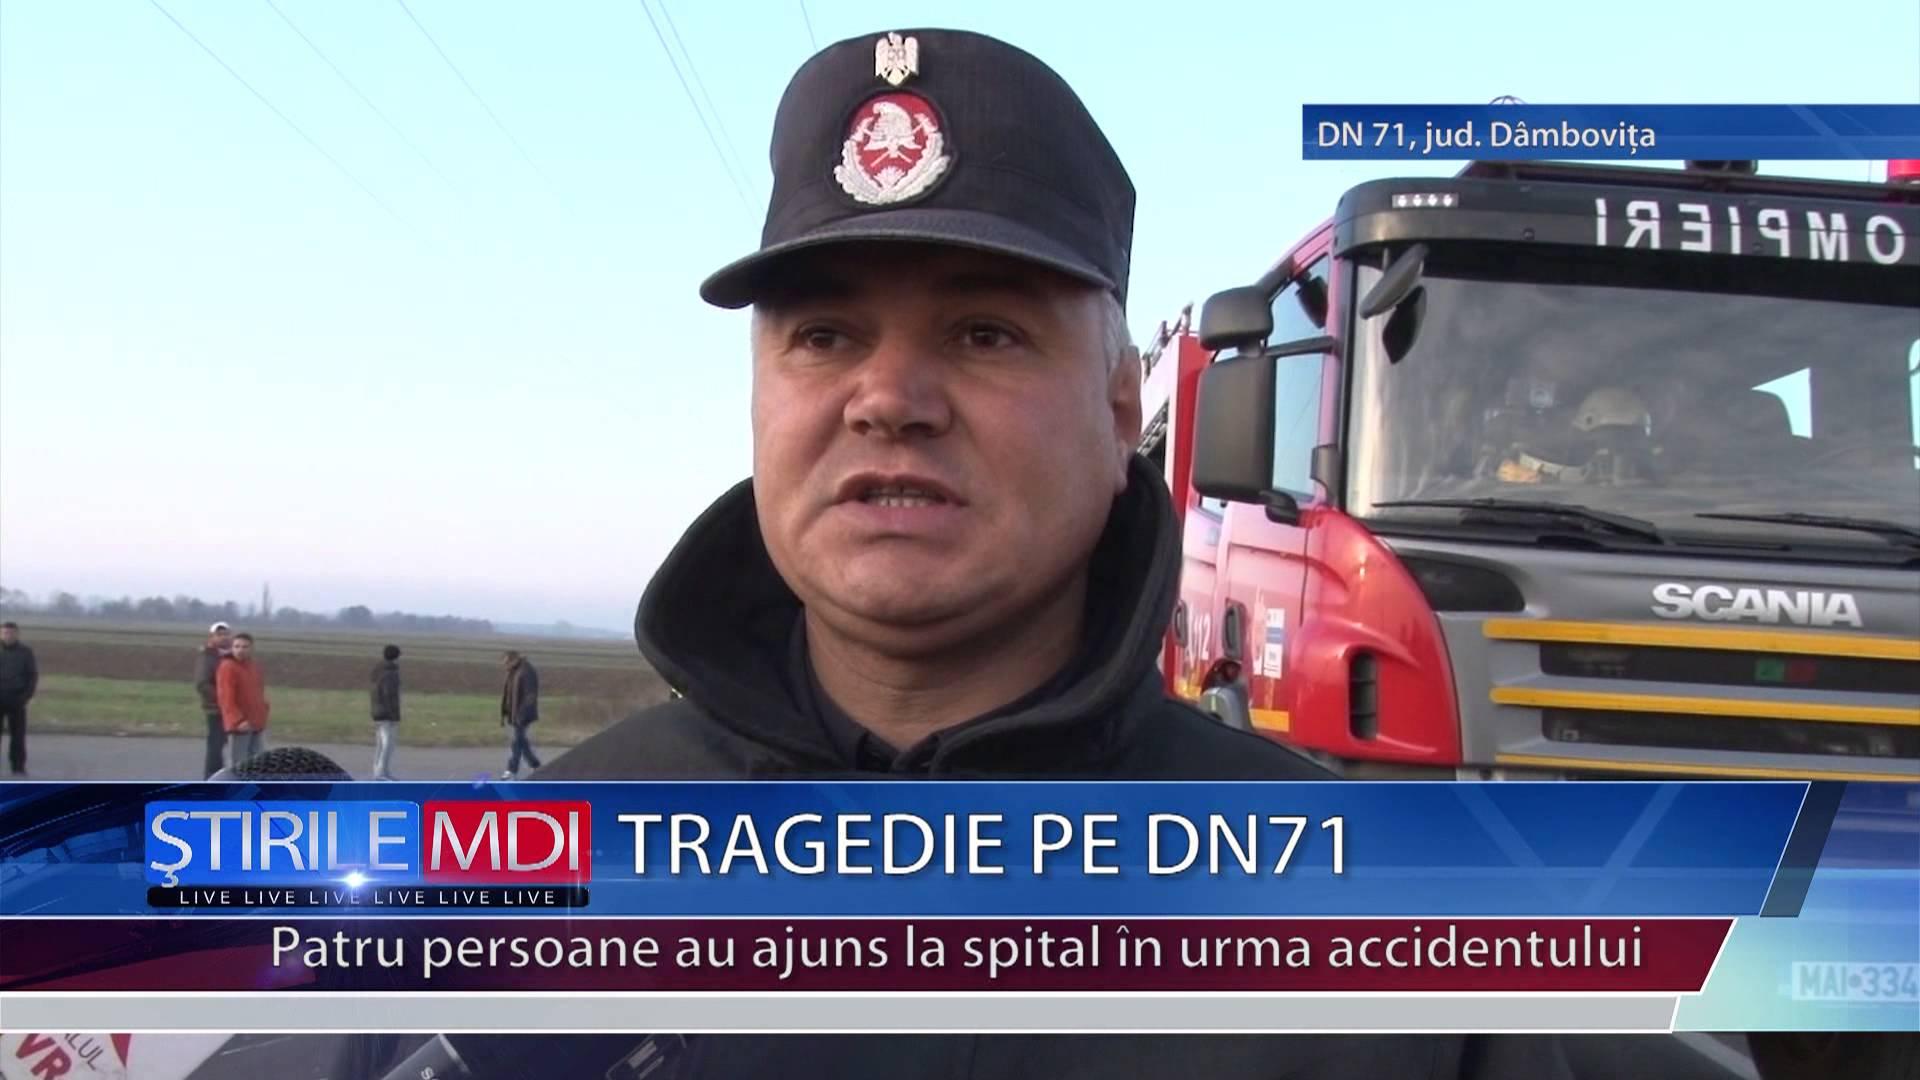 TRAGEDIE PE DN71 – VIDEO